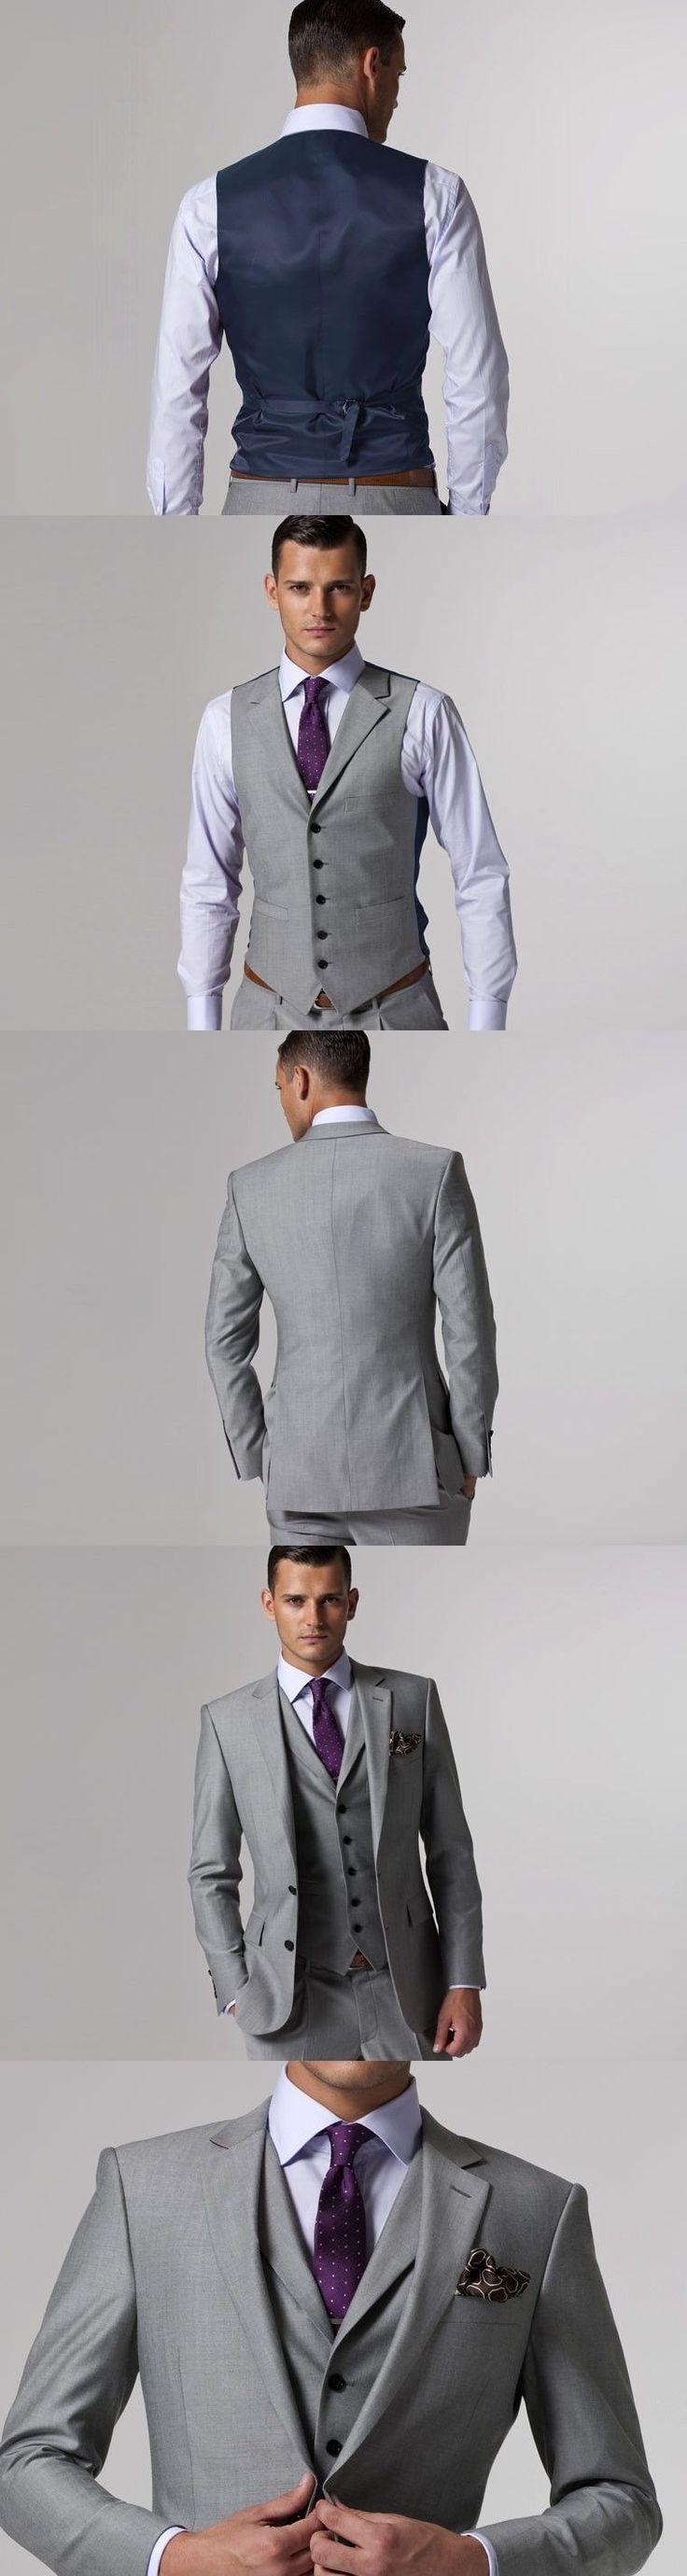 Gray Wedding Tuxedo Custom Made Grey Suits Gray Groom Suit Mens Gray Tuxedo Jacket,2017 Grey Wedding Tuxedos,3 Piece Grey Suit #menssuitsgrey